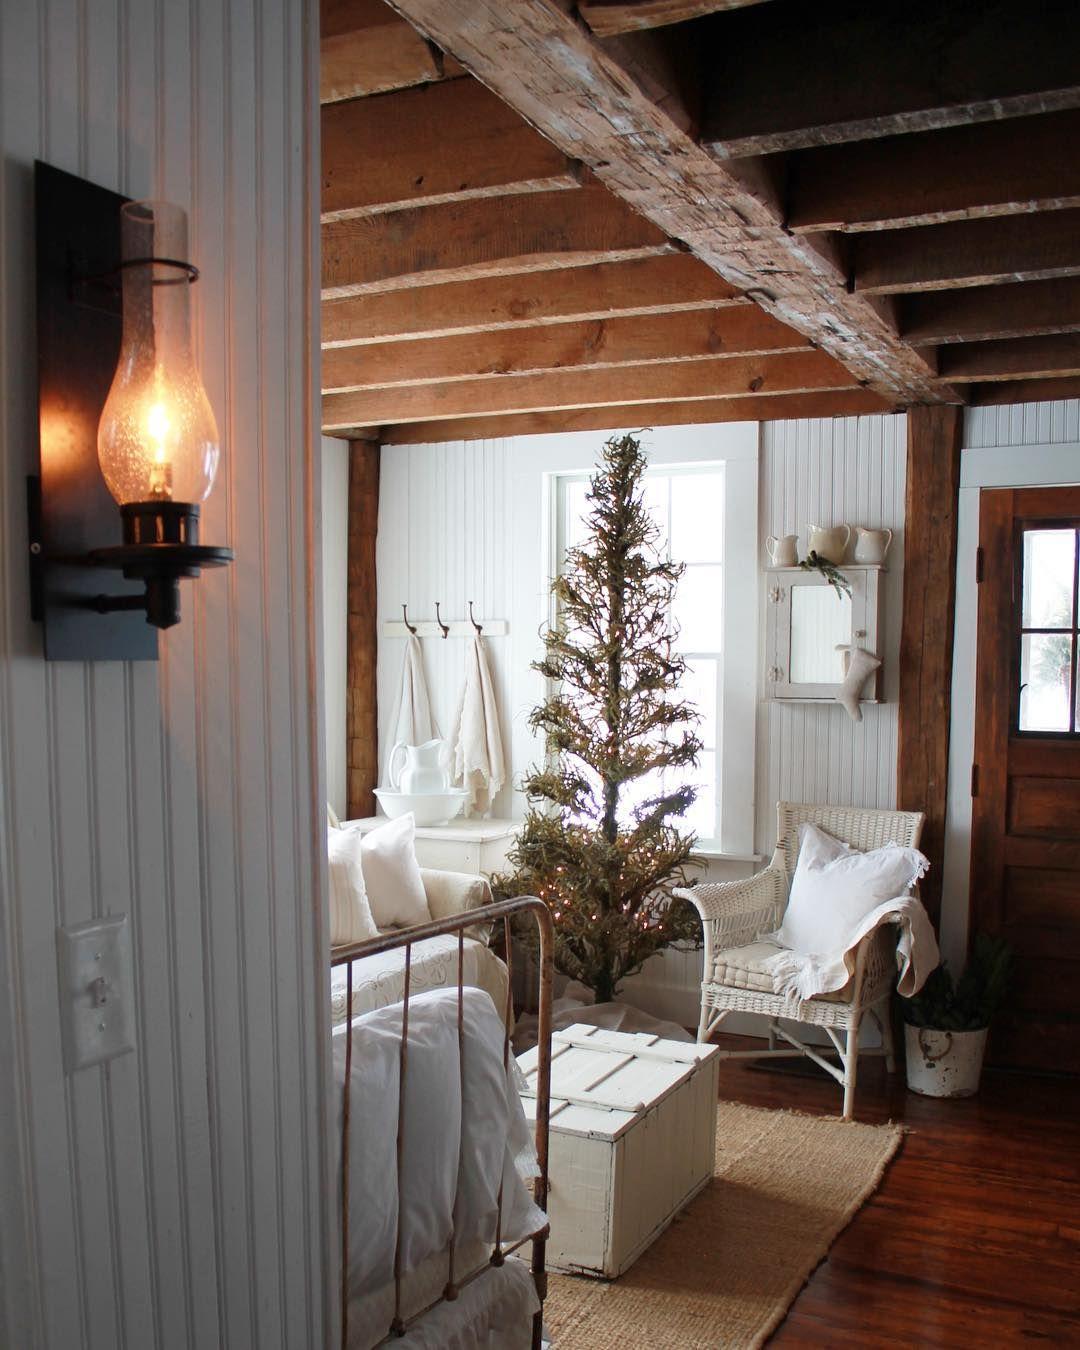 Farmhouse5540 Farmhousechristmas Simplefarmhousestyle